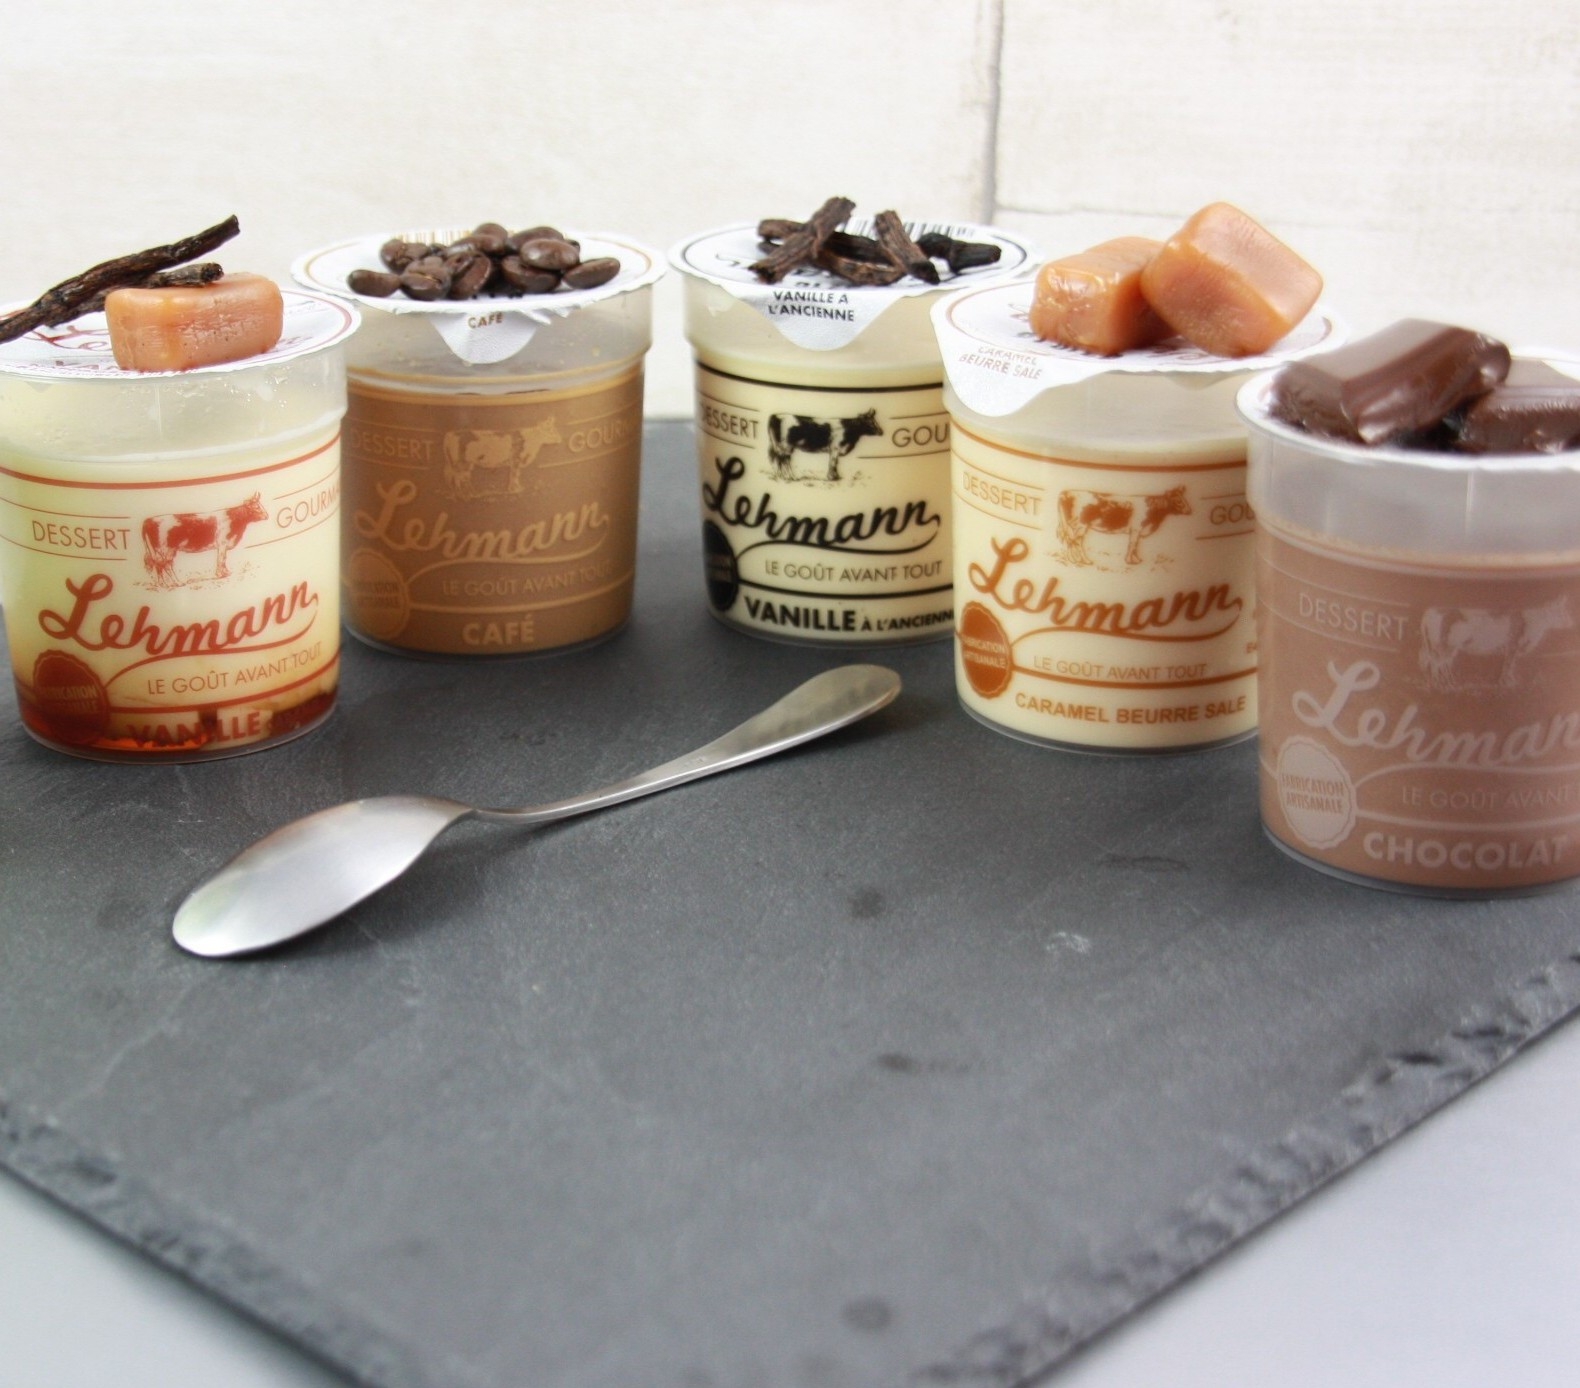 Crème dessert Lehmann